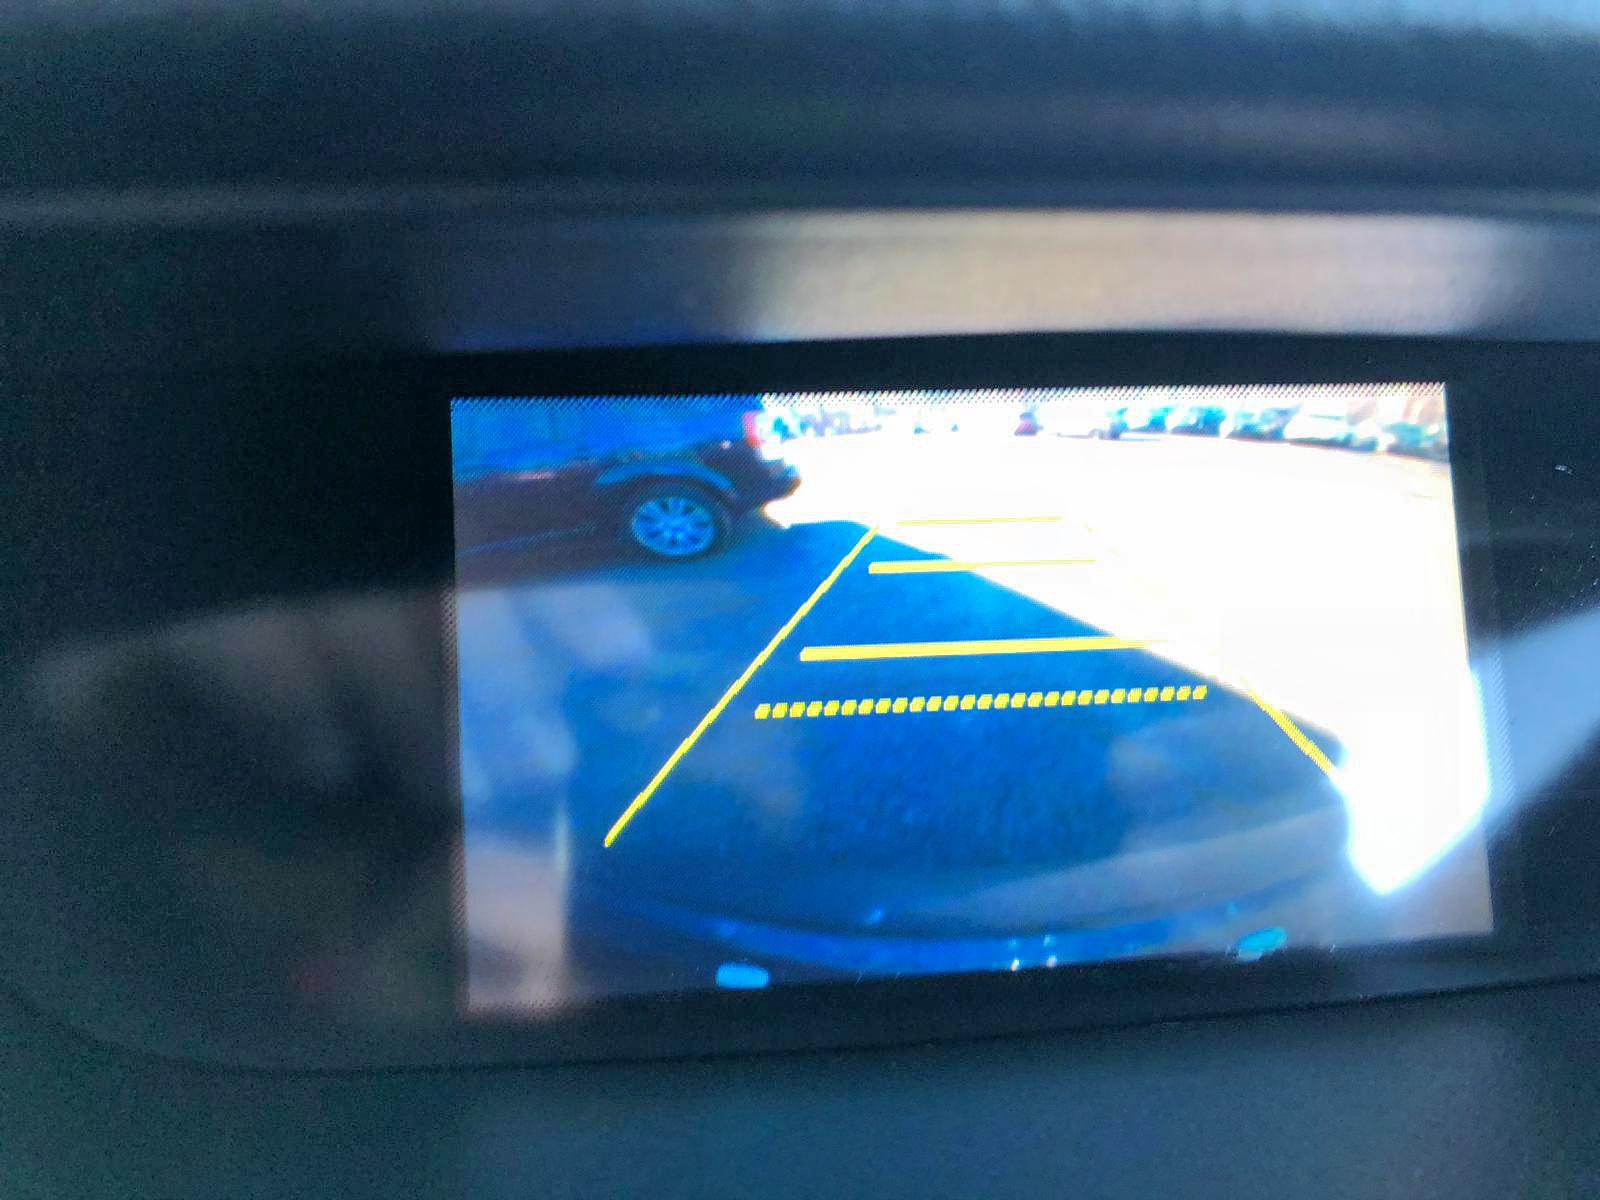 2HKRM4H73CH626699 - 2012 Honda Cr-V Exl 2.4L engine view